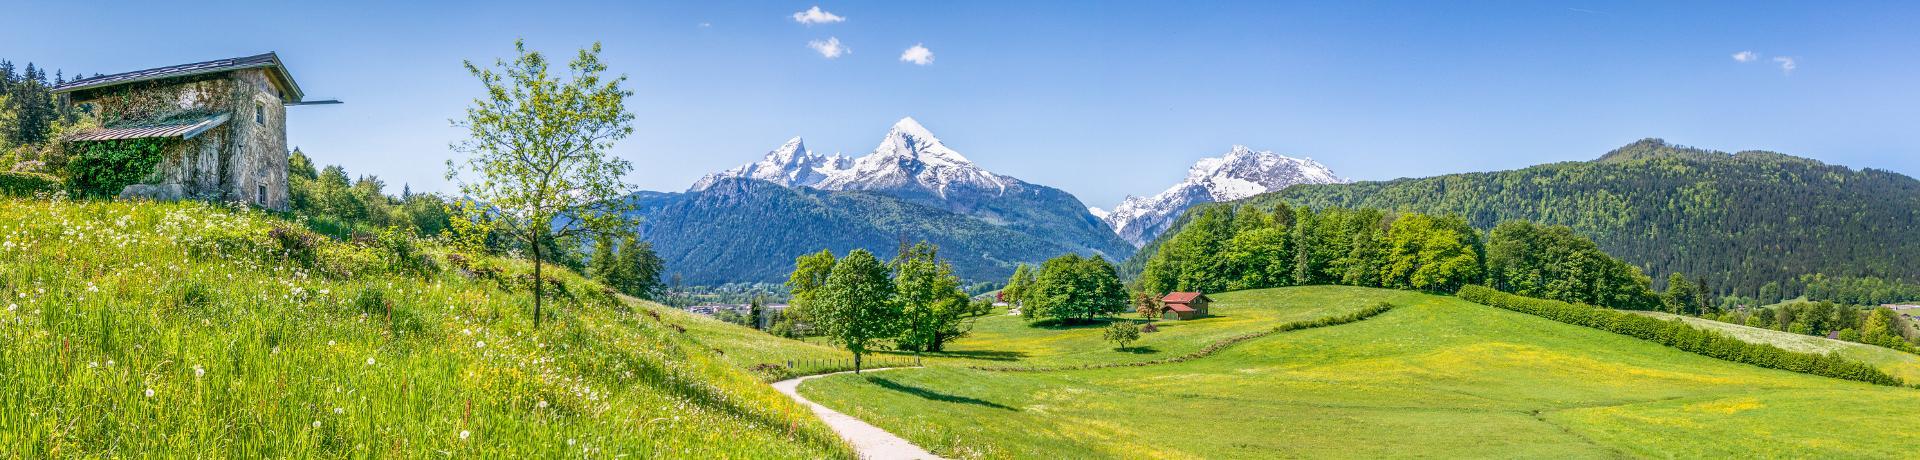 Deutschland: Alpen - Berchtesgaden